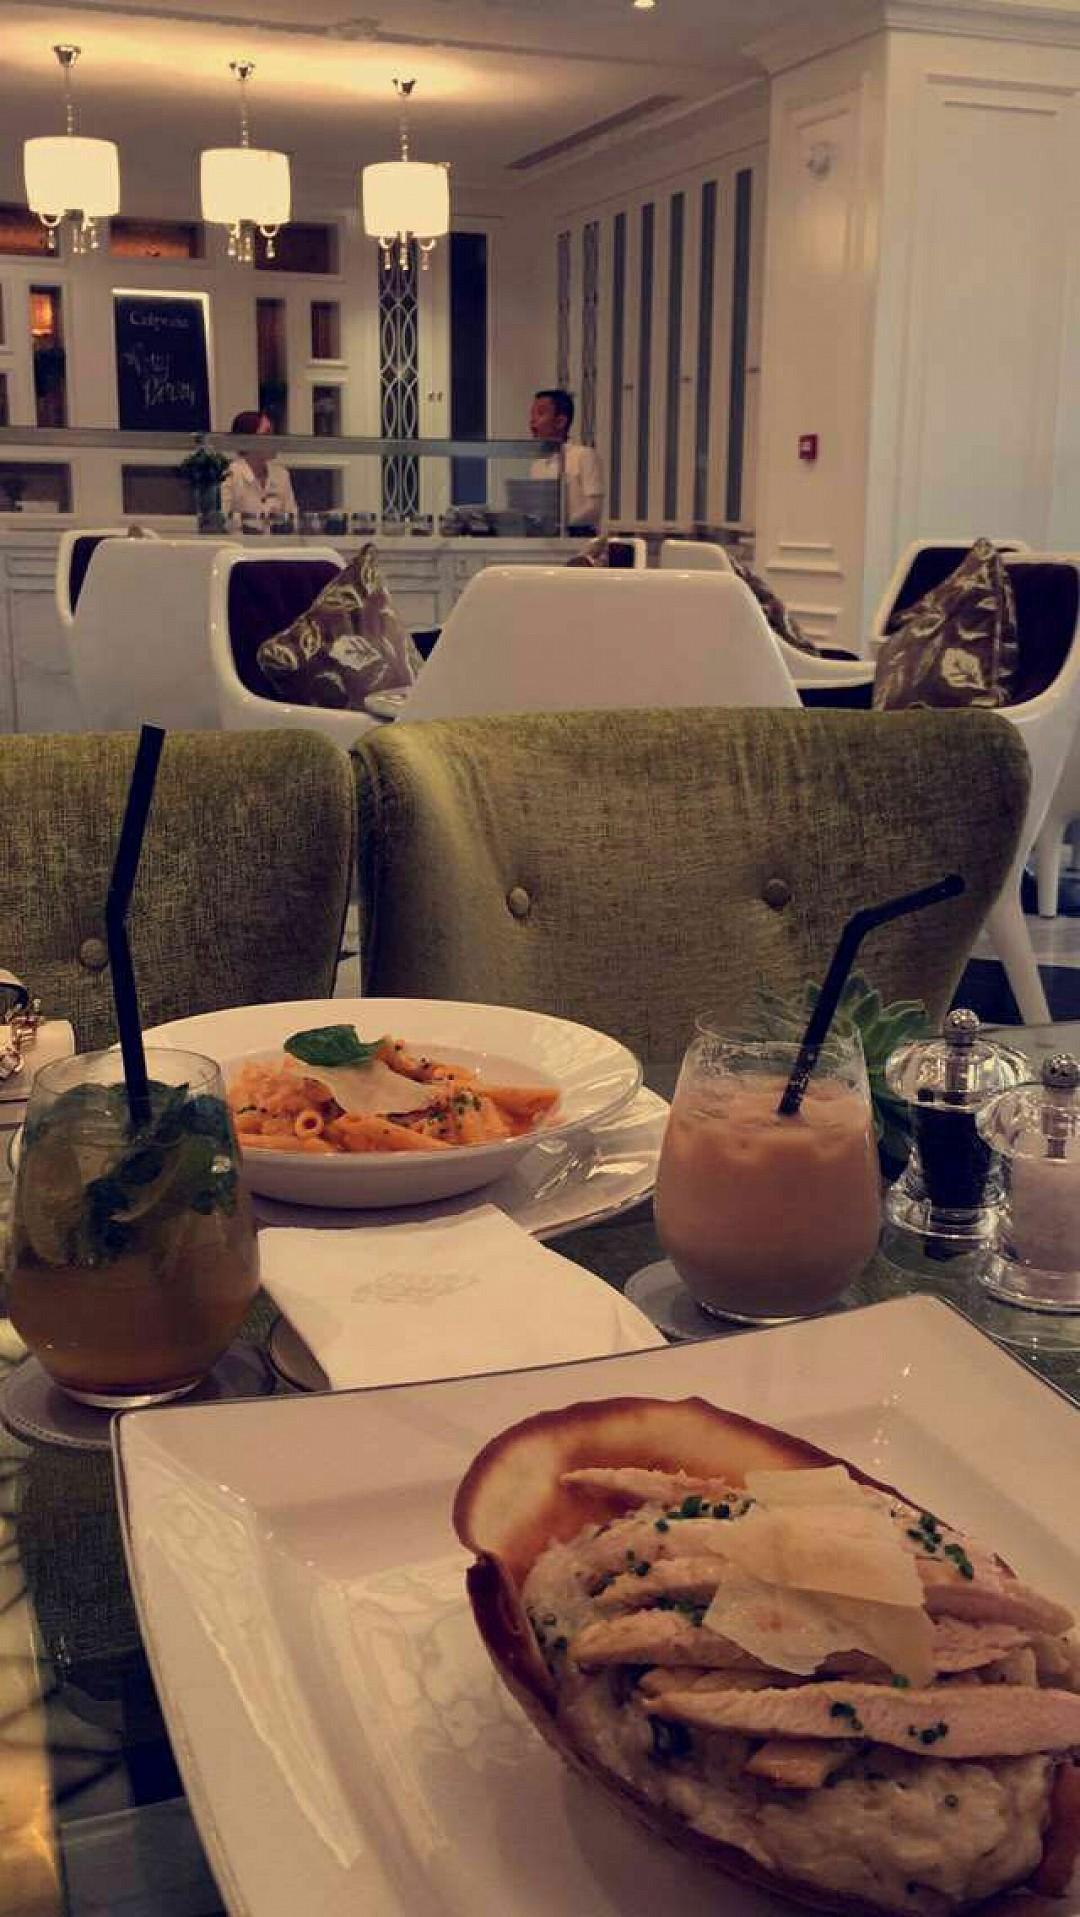 #غدا #باستا #ساش @ Sash Cafe - Bahrain